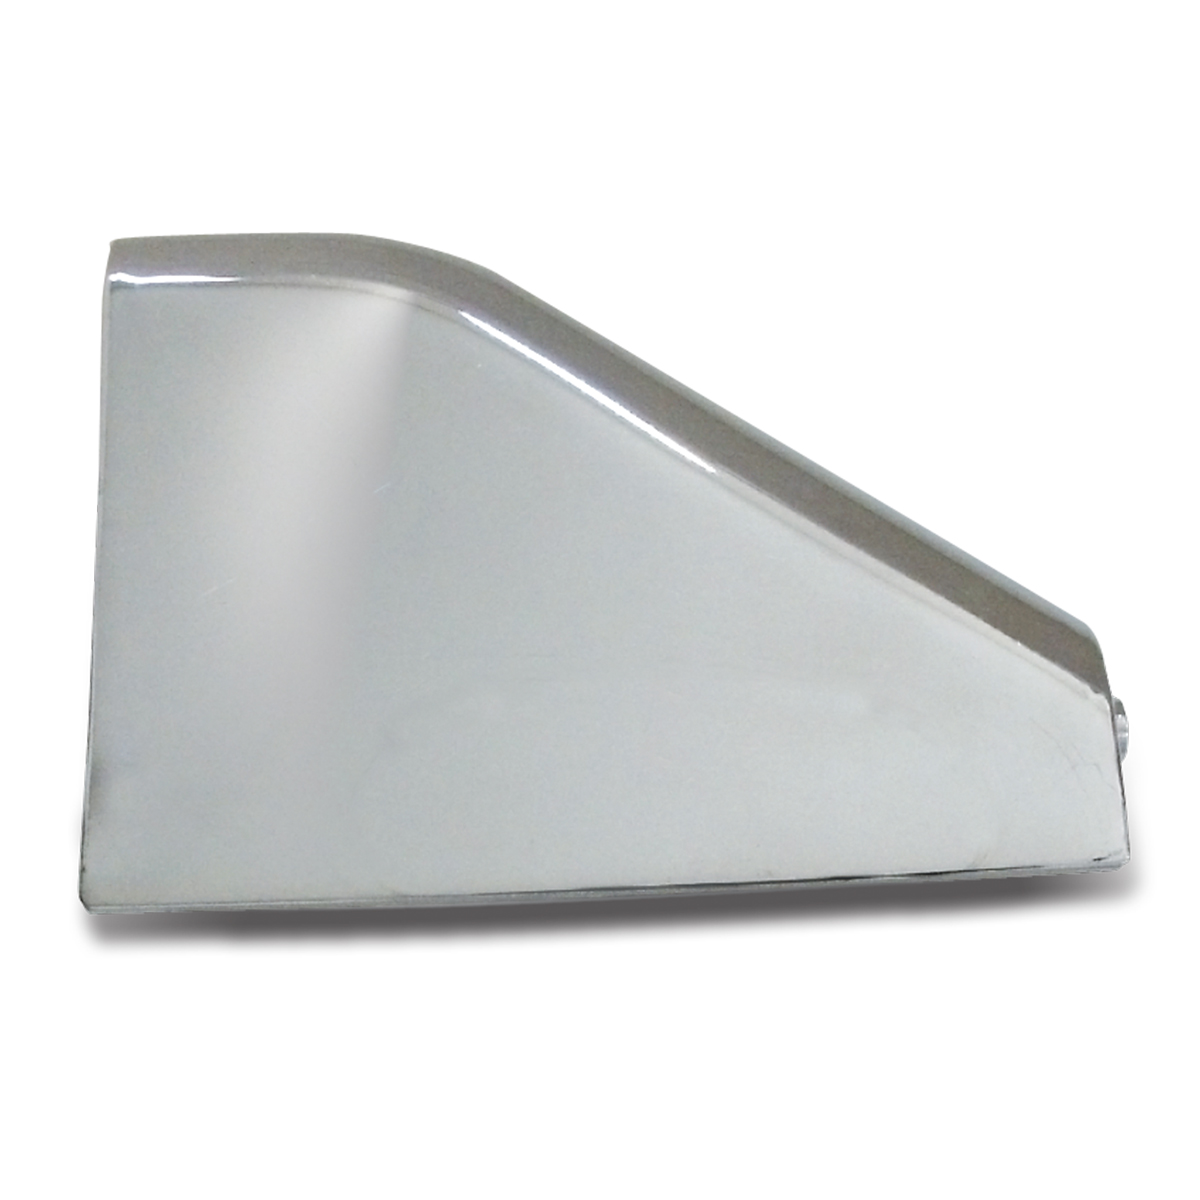 68725 Chrome Plastic Ash Tray Cover for FL Century/Columbia/Coronado